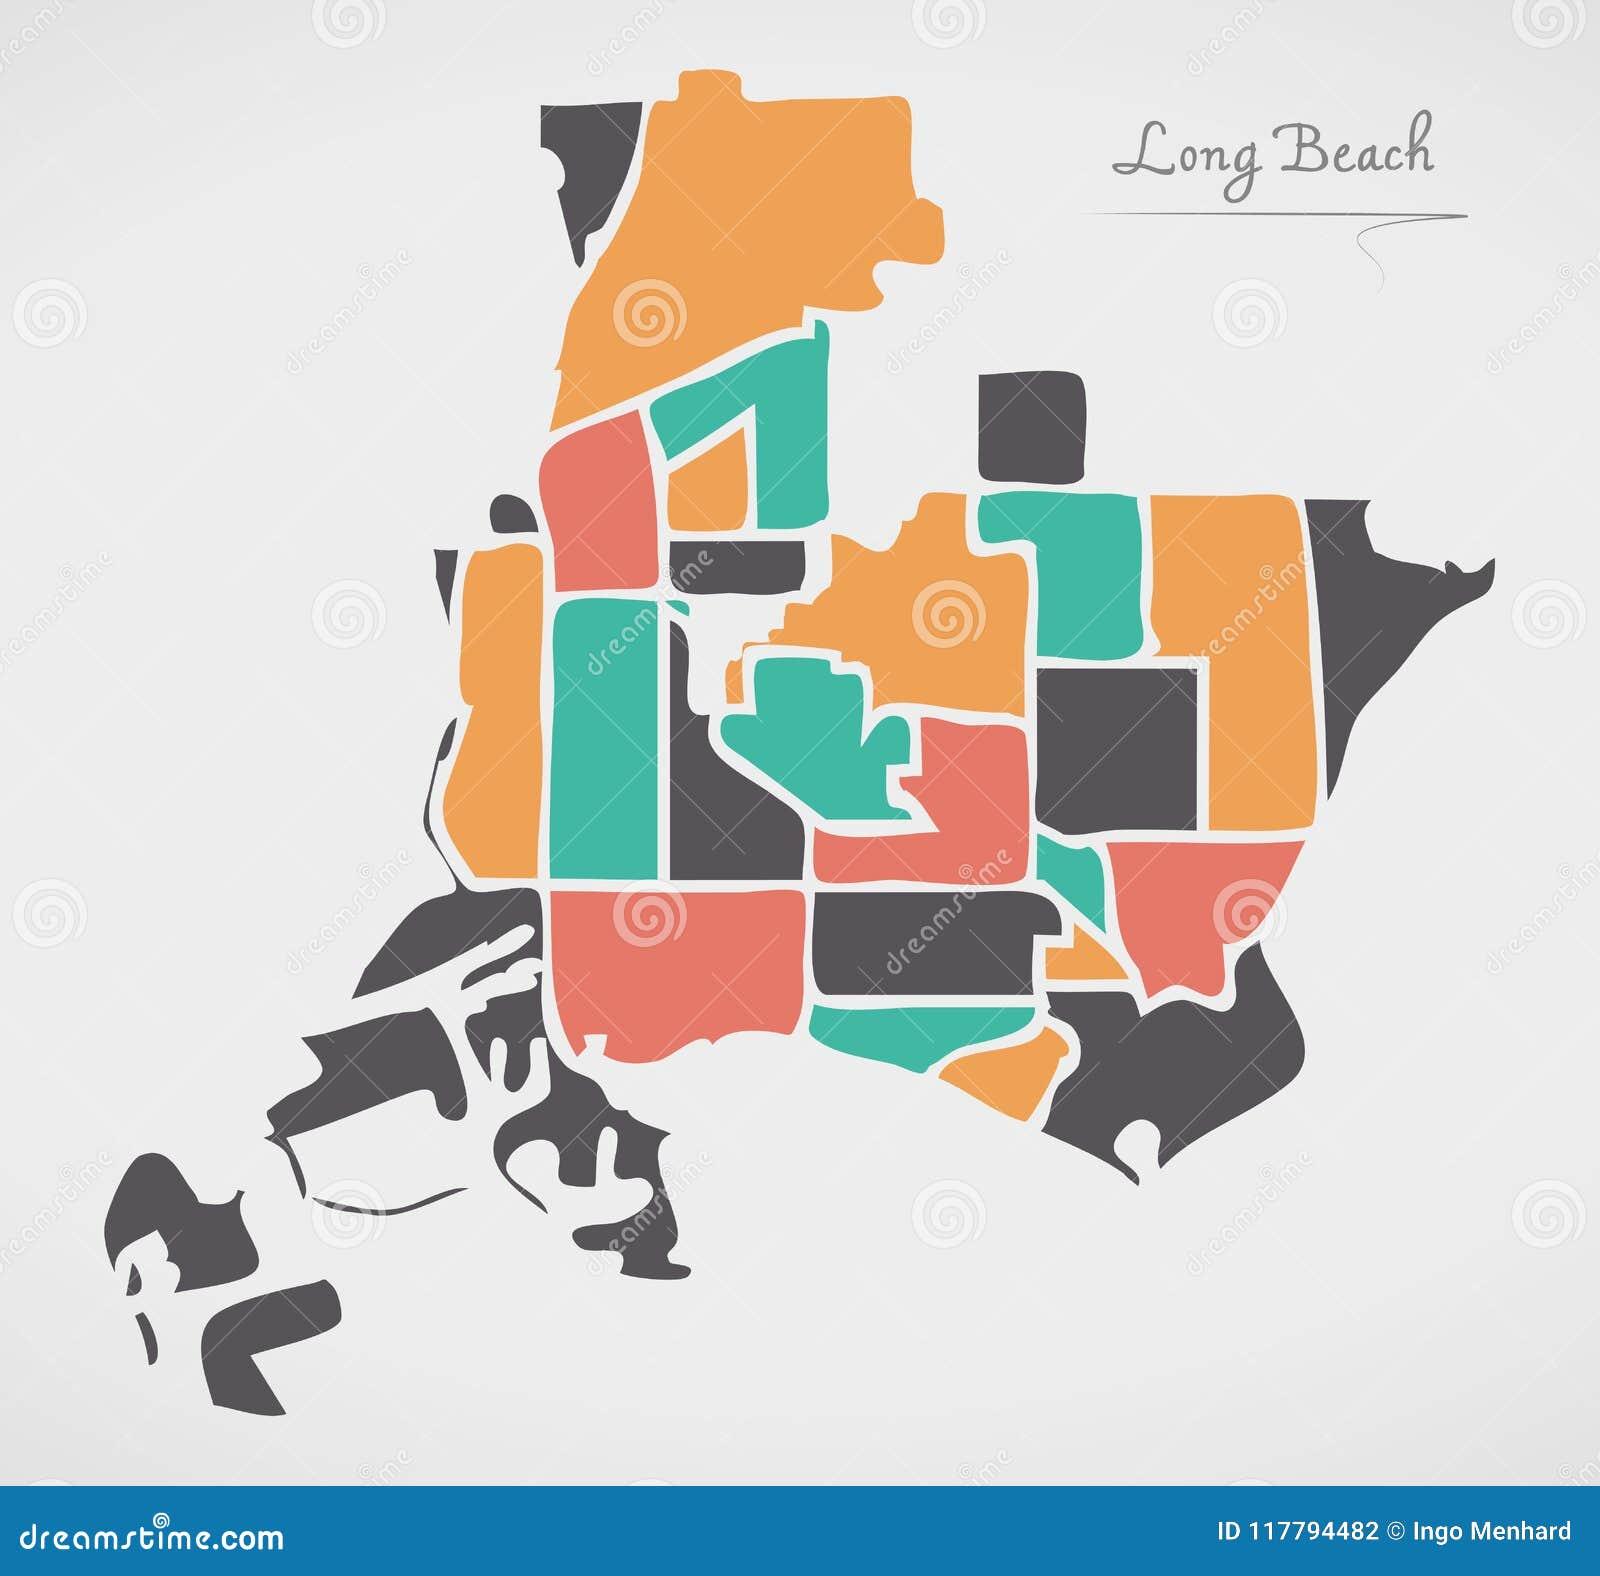 Long Beach California Map With Neighborhoods And Modern ...